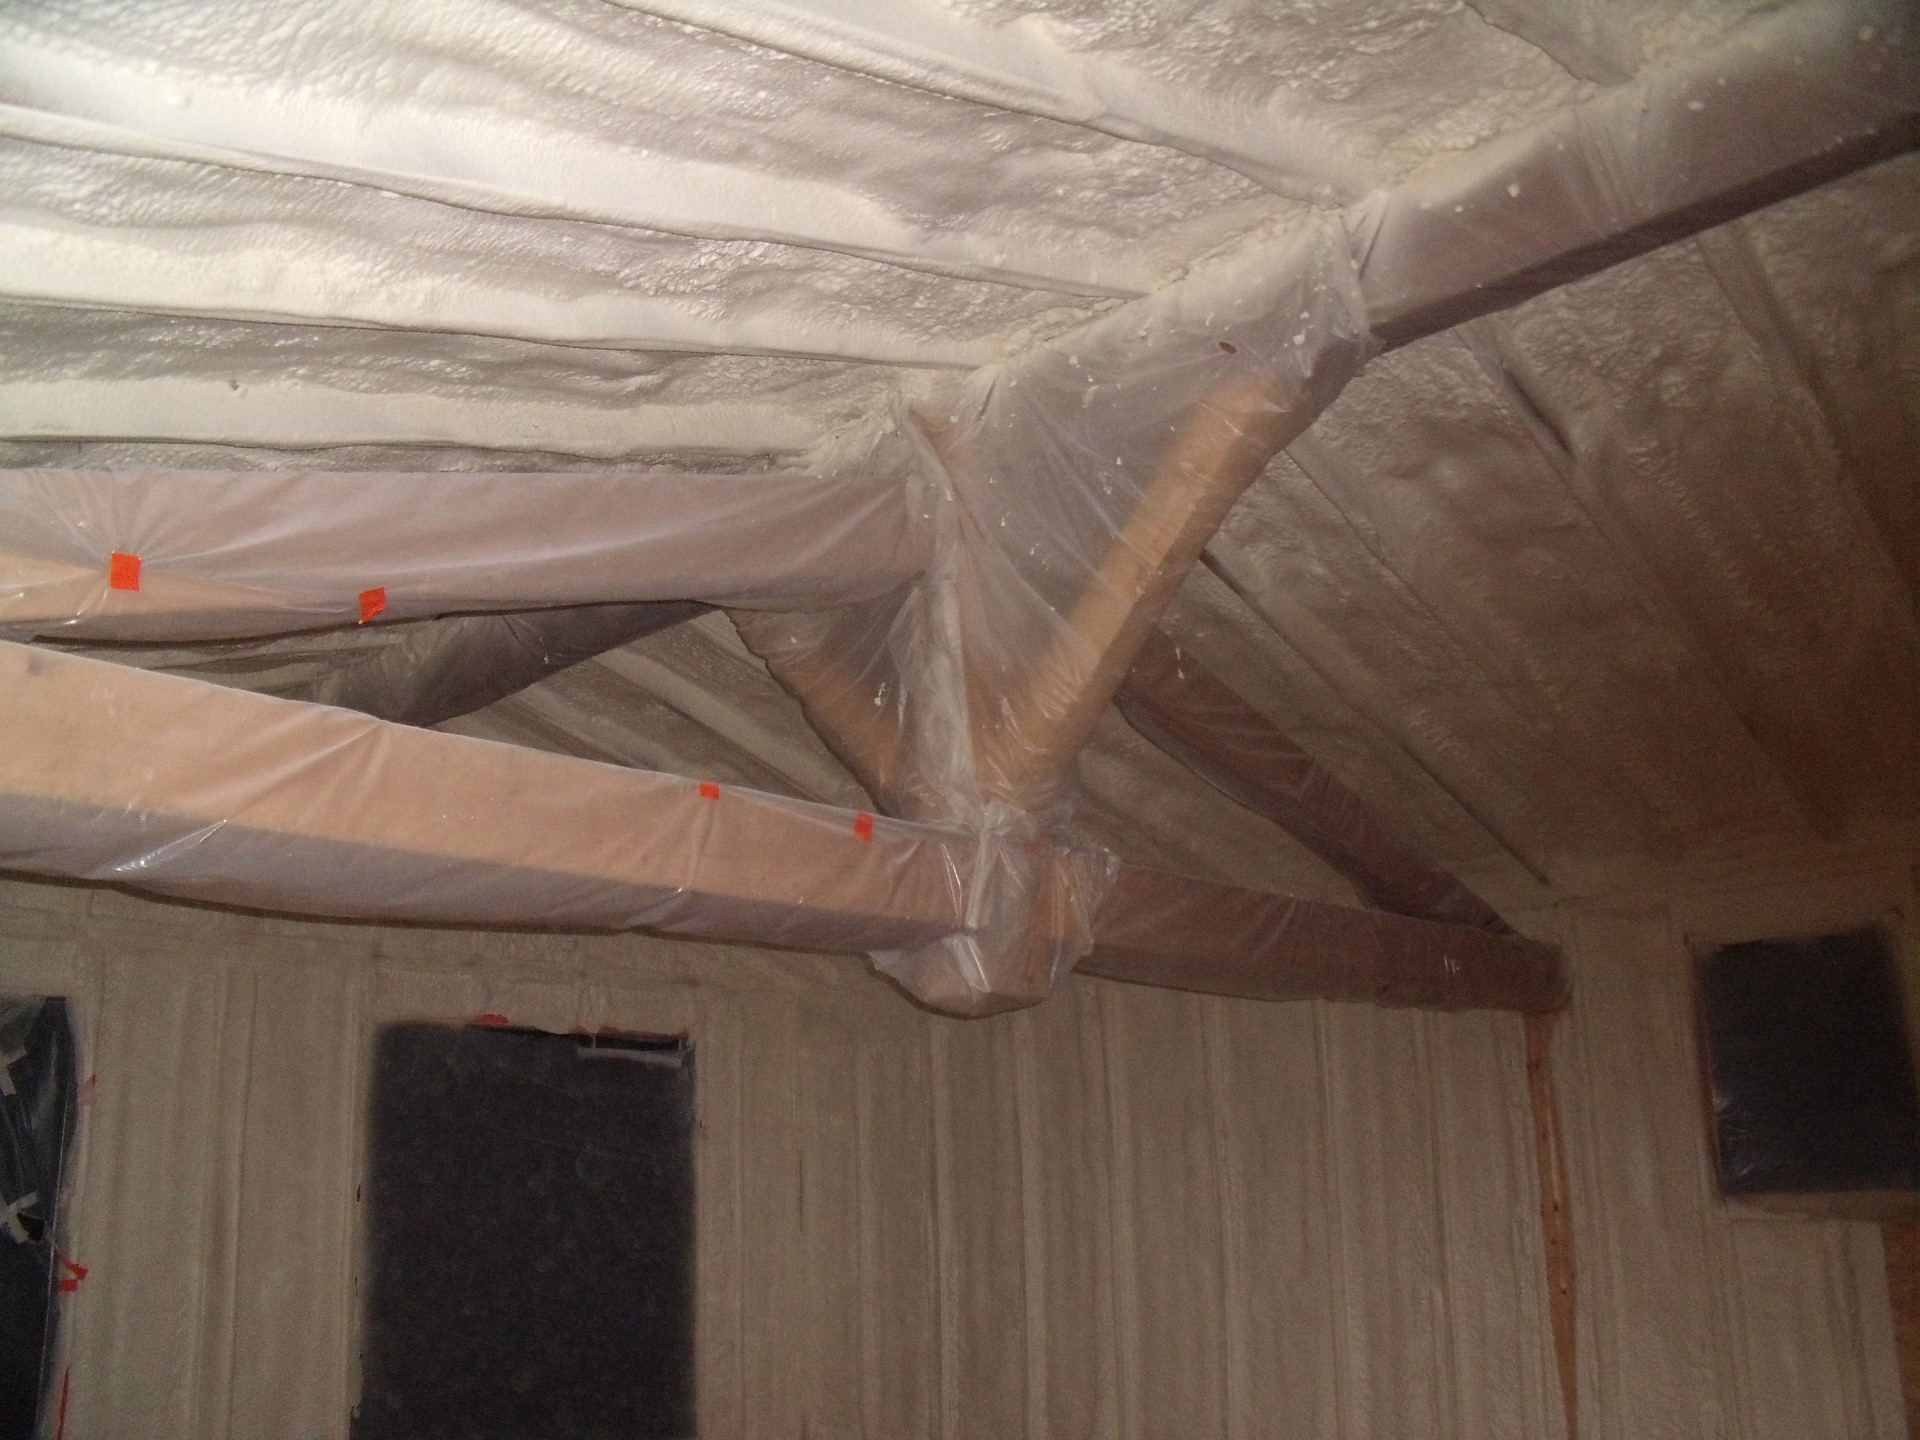 isolation des toitures par mousse polyur thane cf isolation. Black Bedroom Furniture Sets. Home Design Ideas